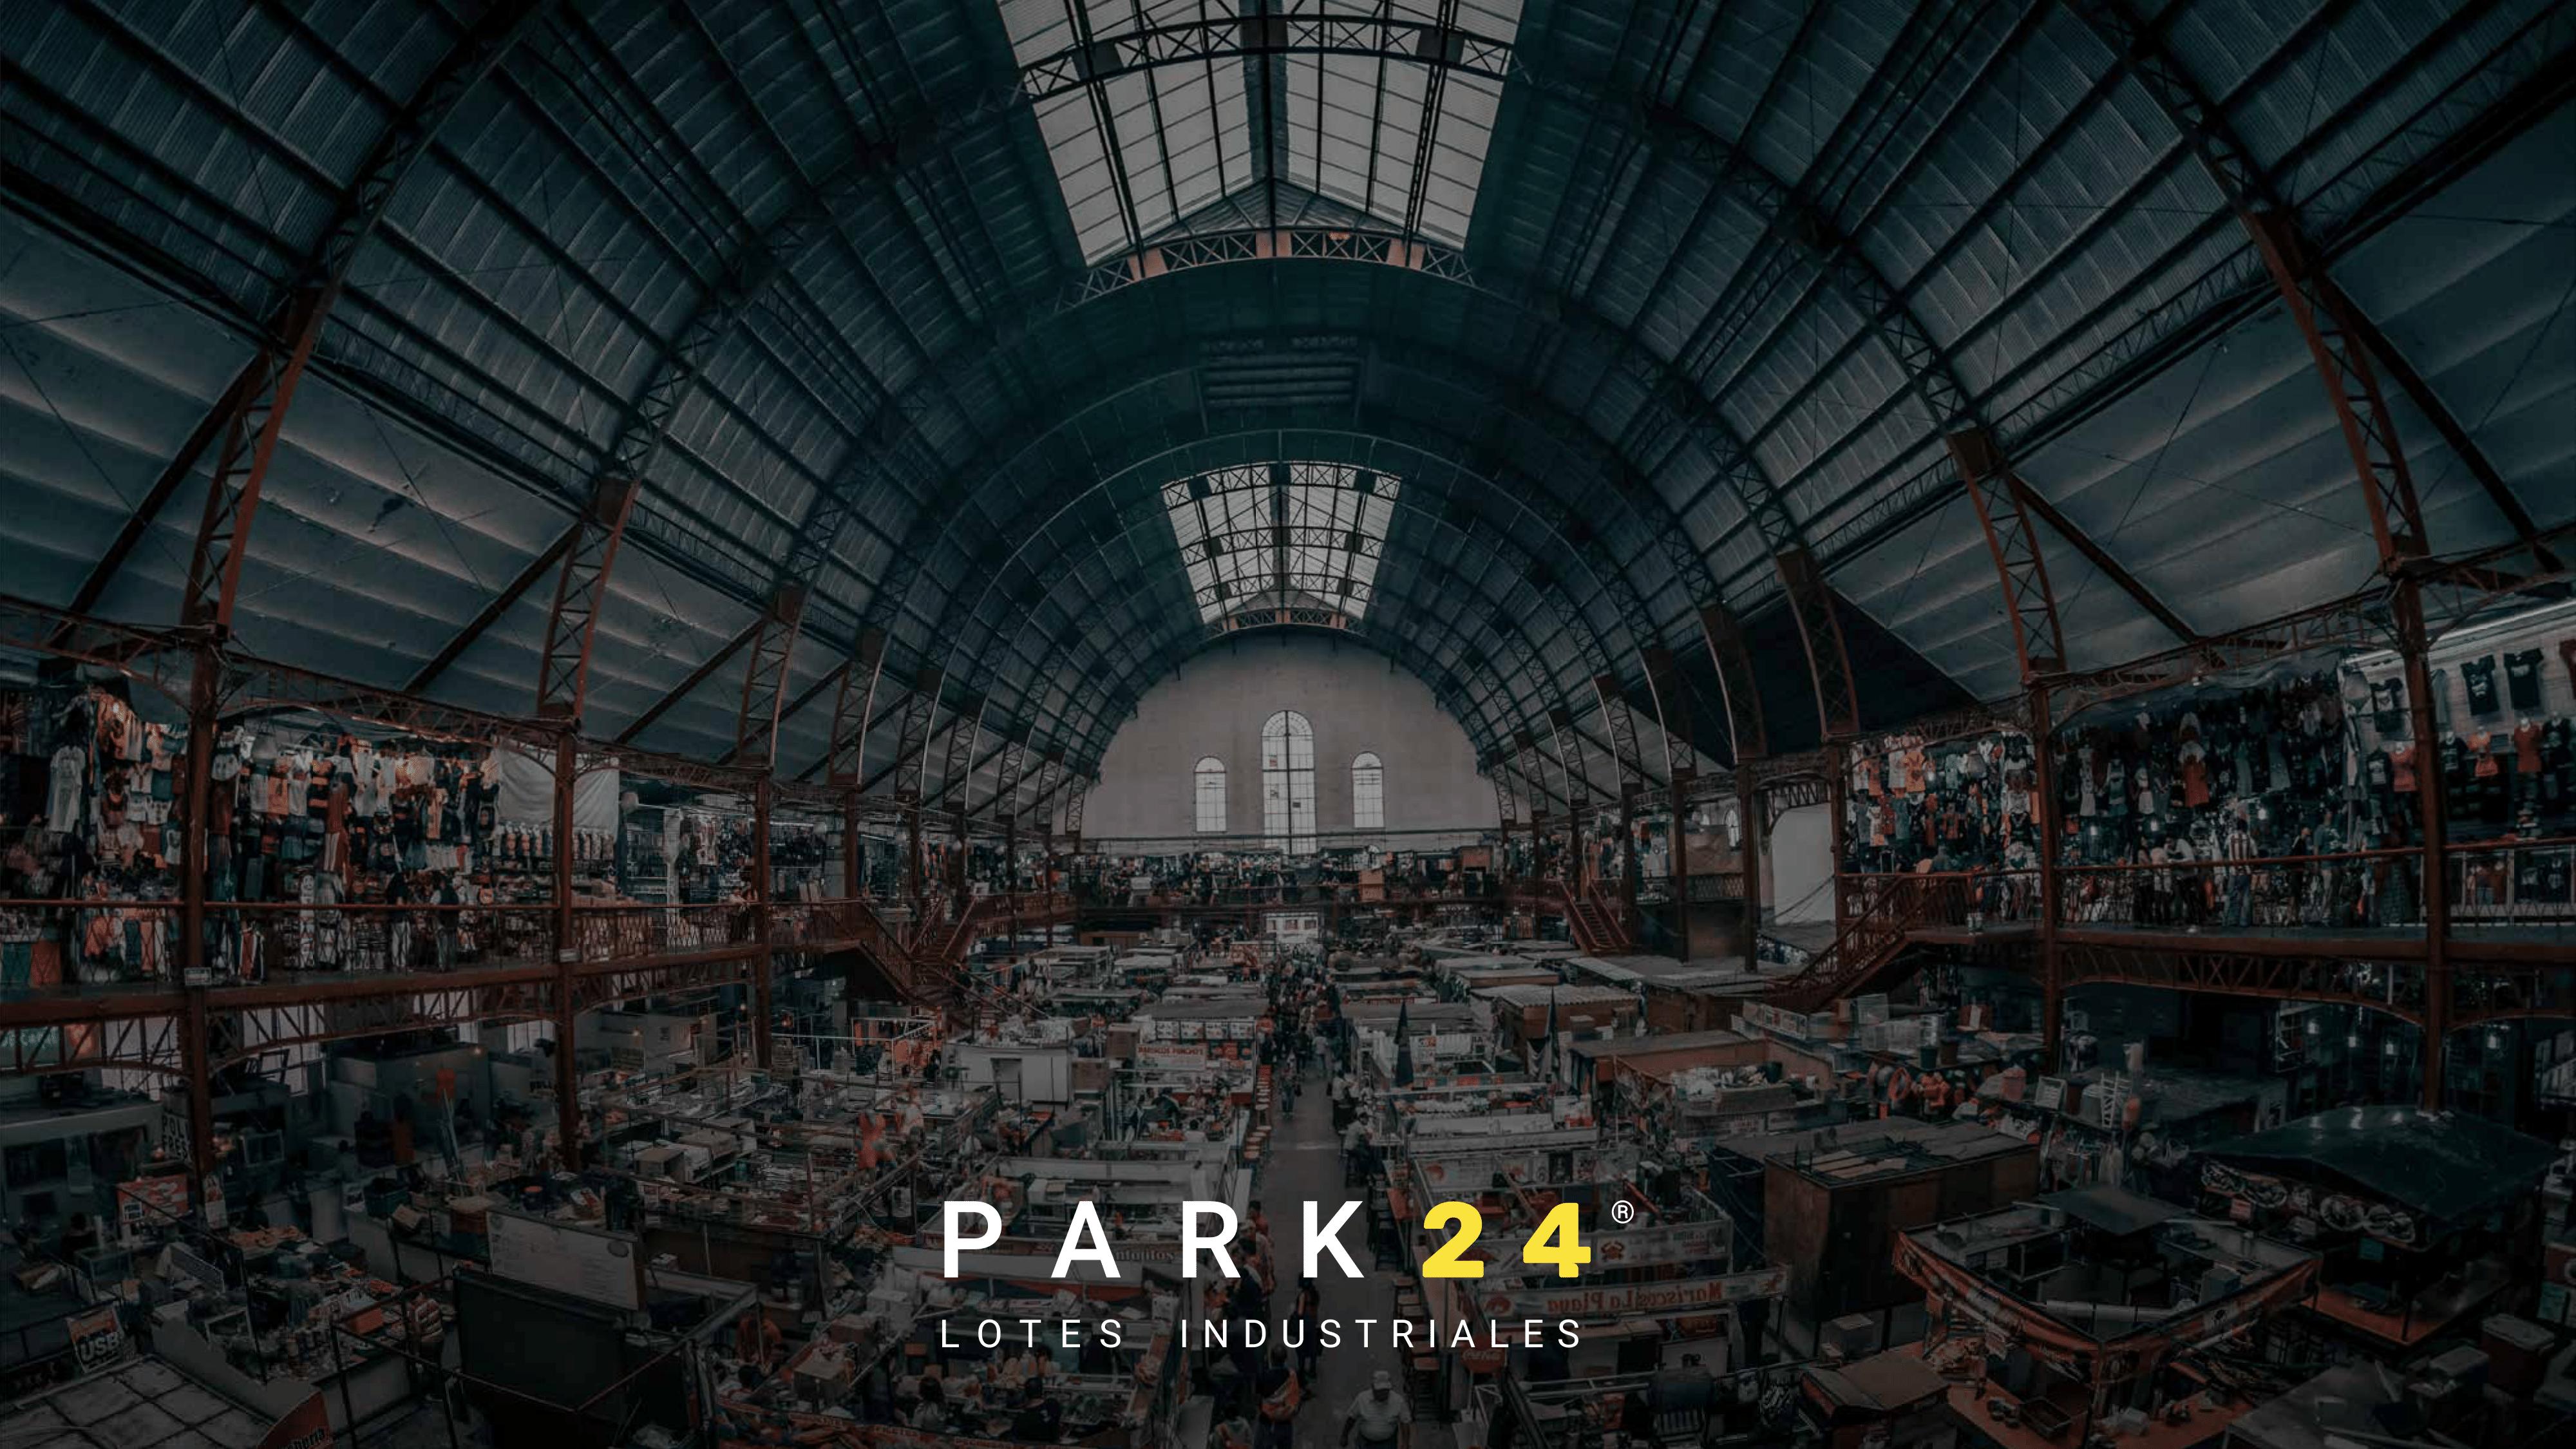 PARK 24-LOTES INDUSTRIALES